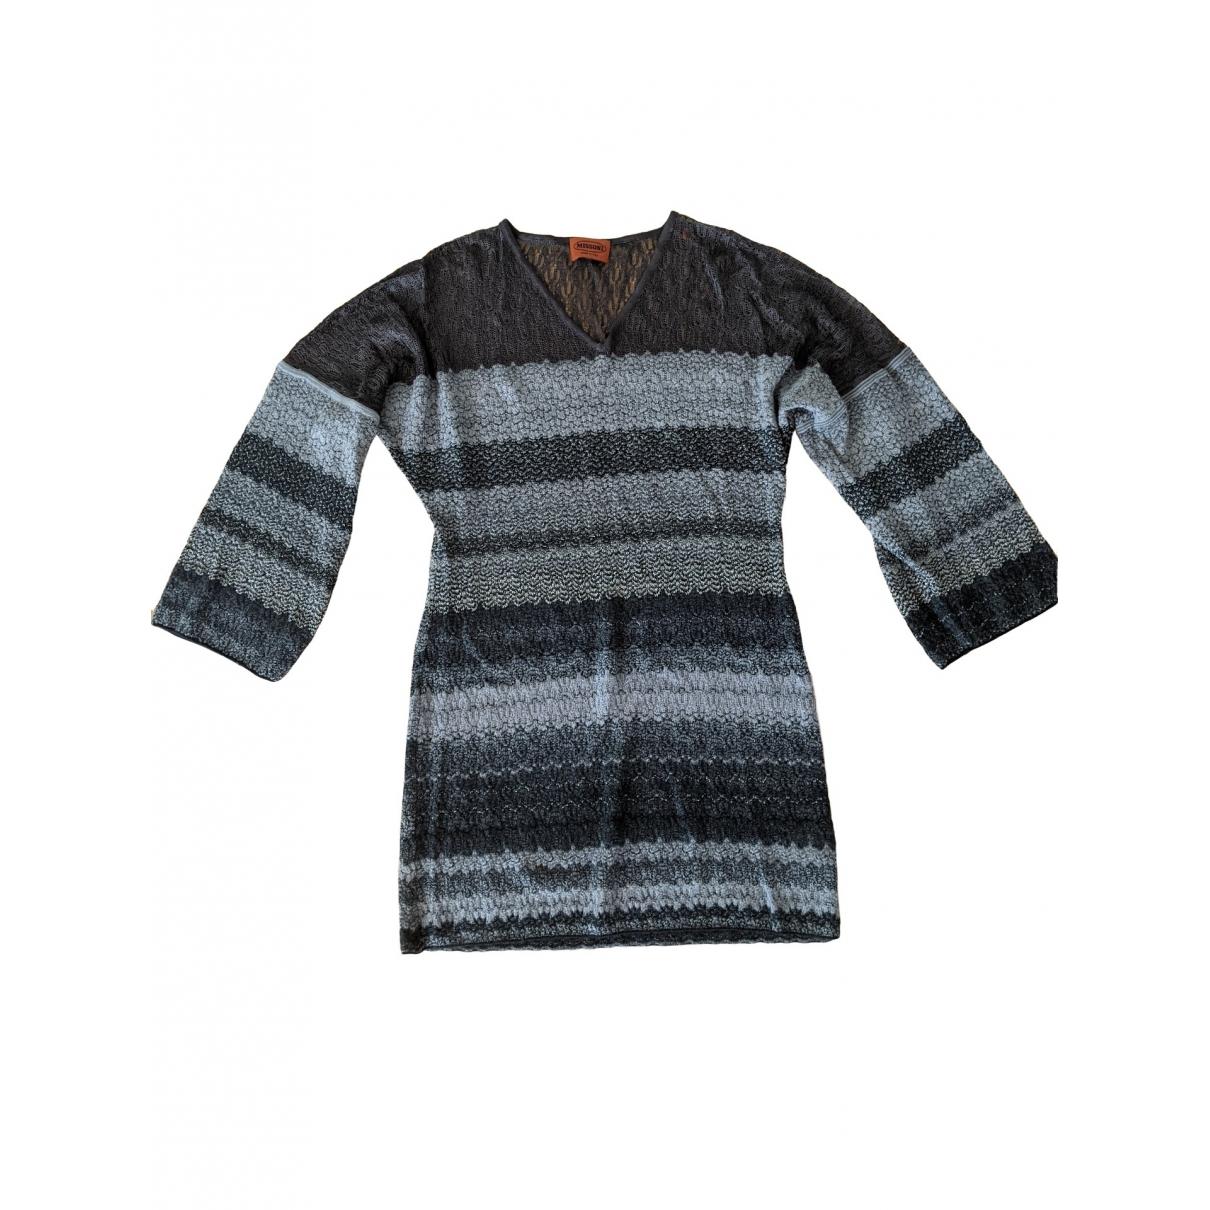 Missoni \N Grey Cashmere dress for Women 40 IT